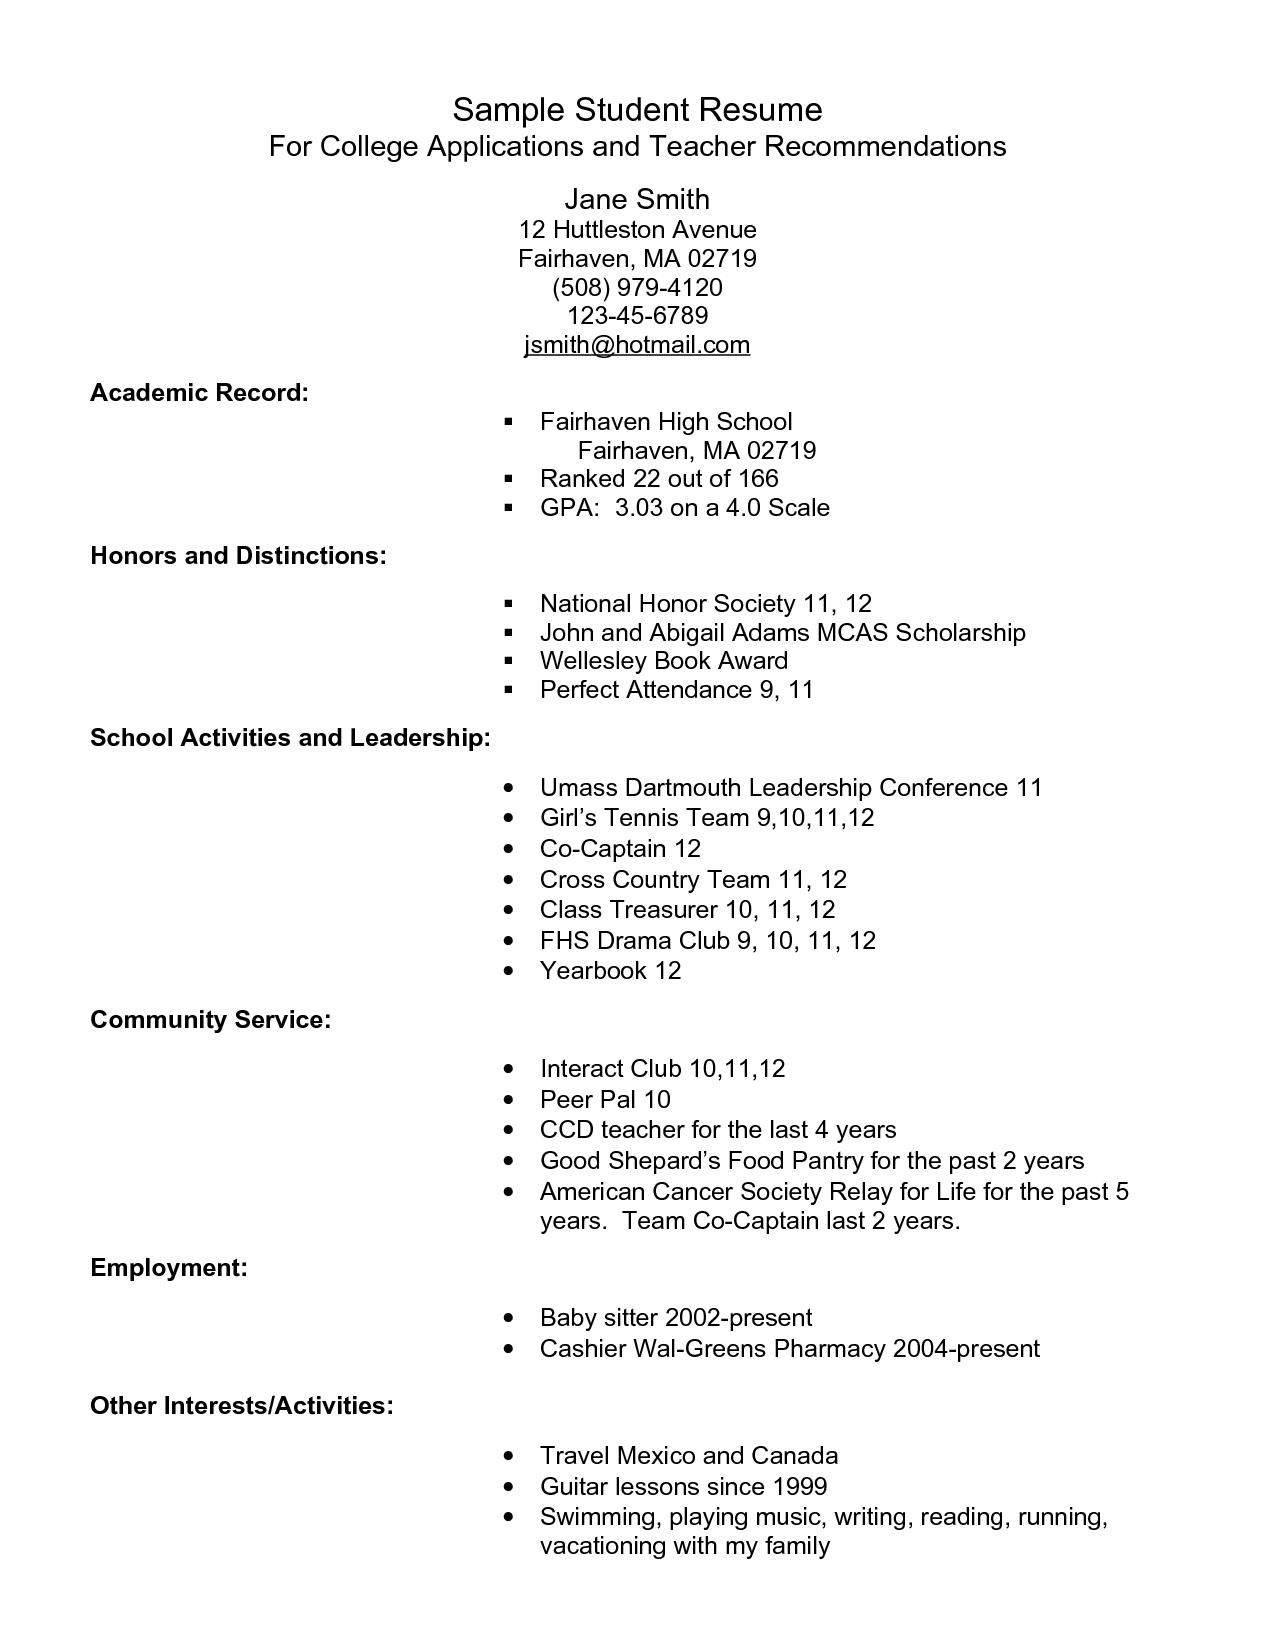 College Admission Resume Template  Sample Student Resume - PDF